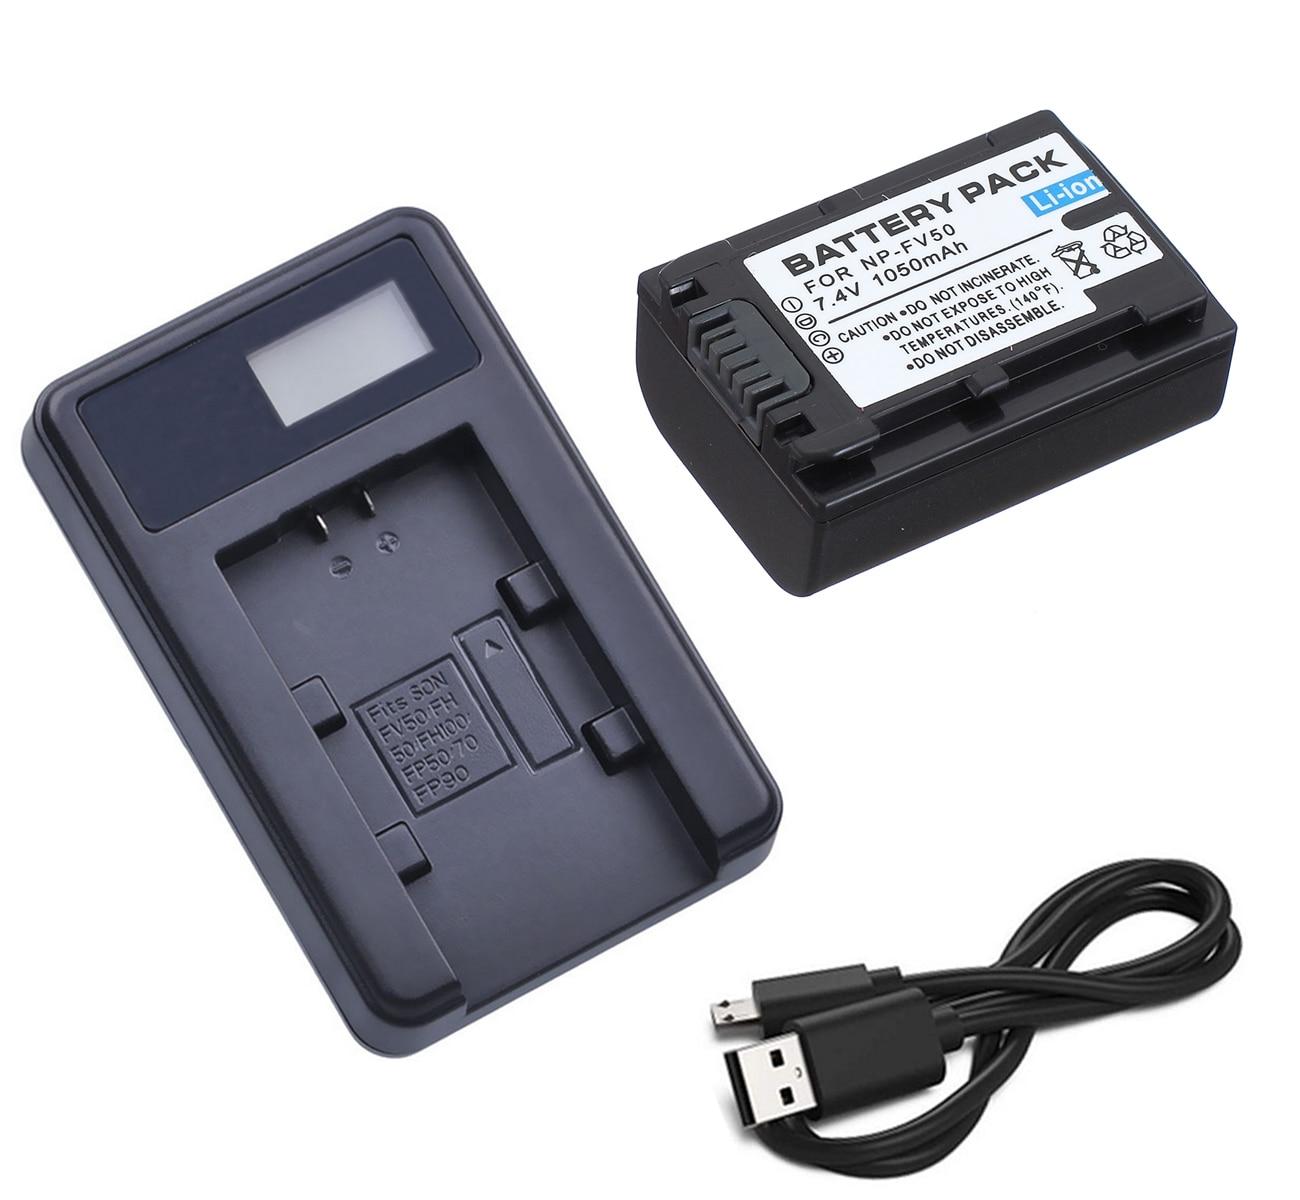 Battery Pack for Sony HDR-PJ600V HDR-PJ630V Handycam Camcorder HDR-PJ610 HDR-PJ620